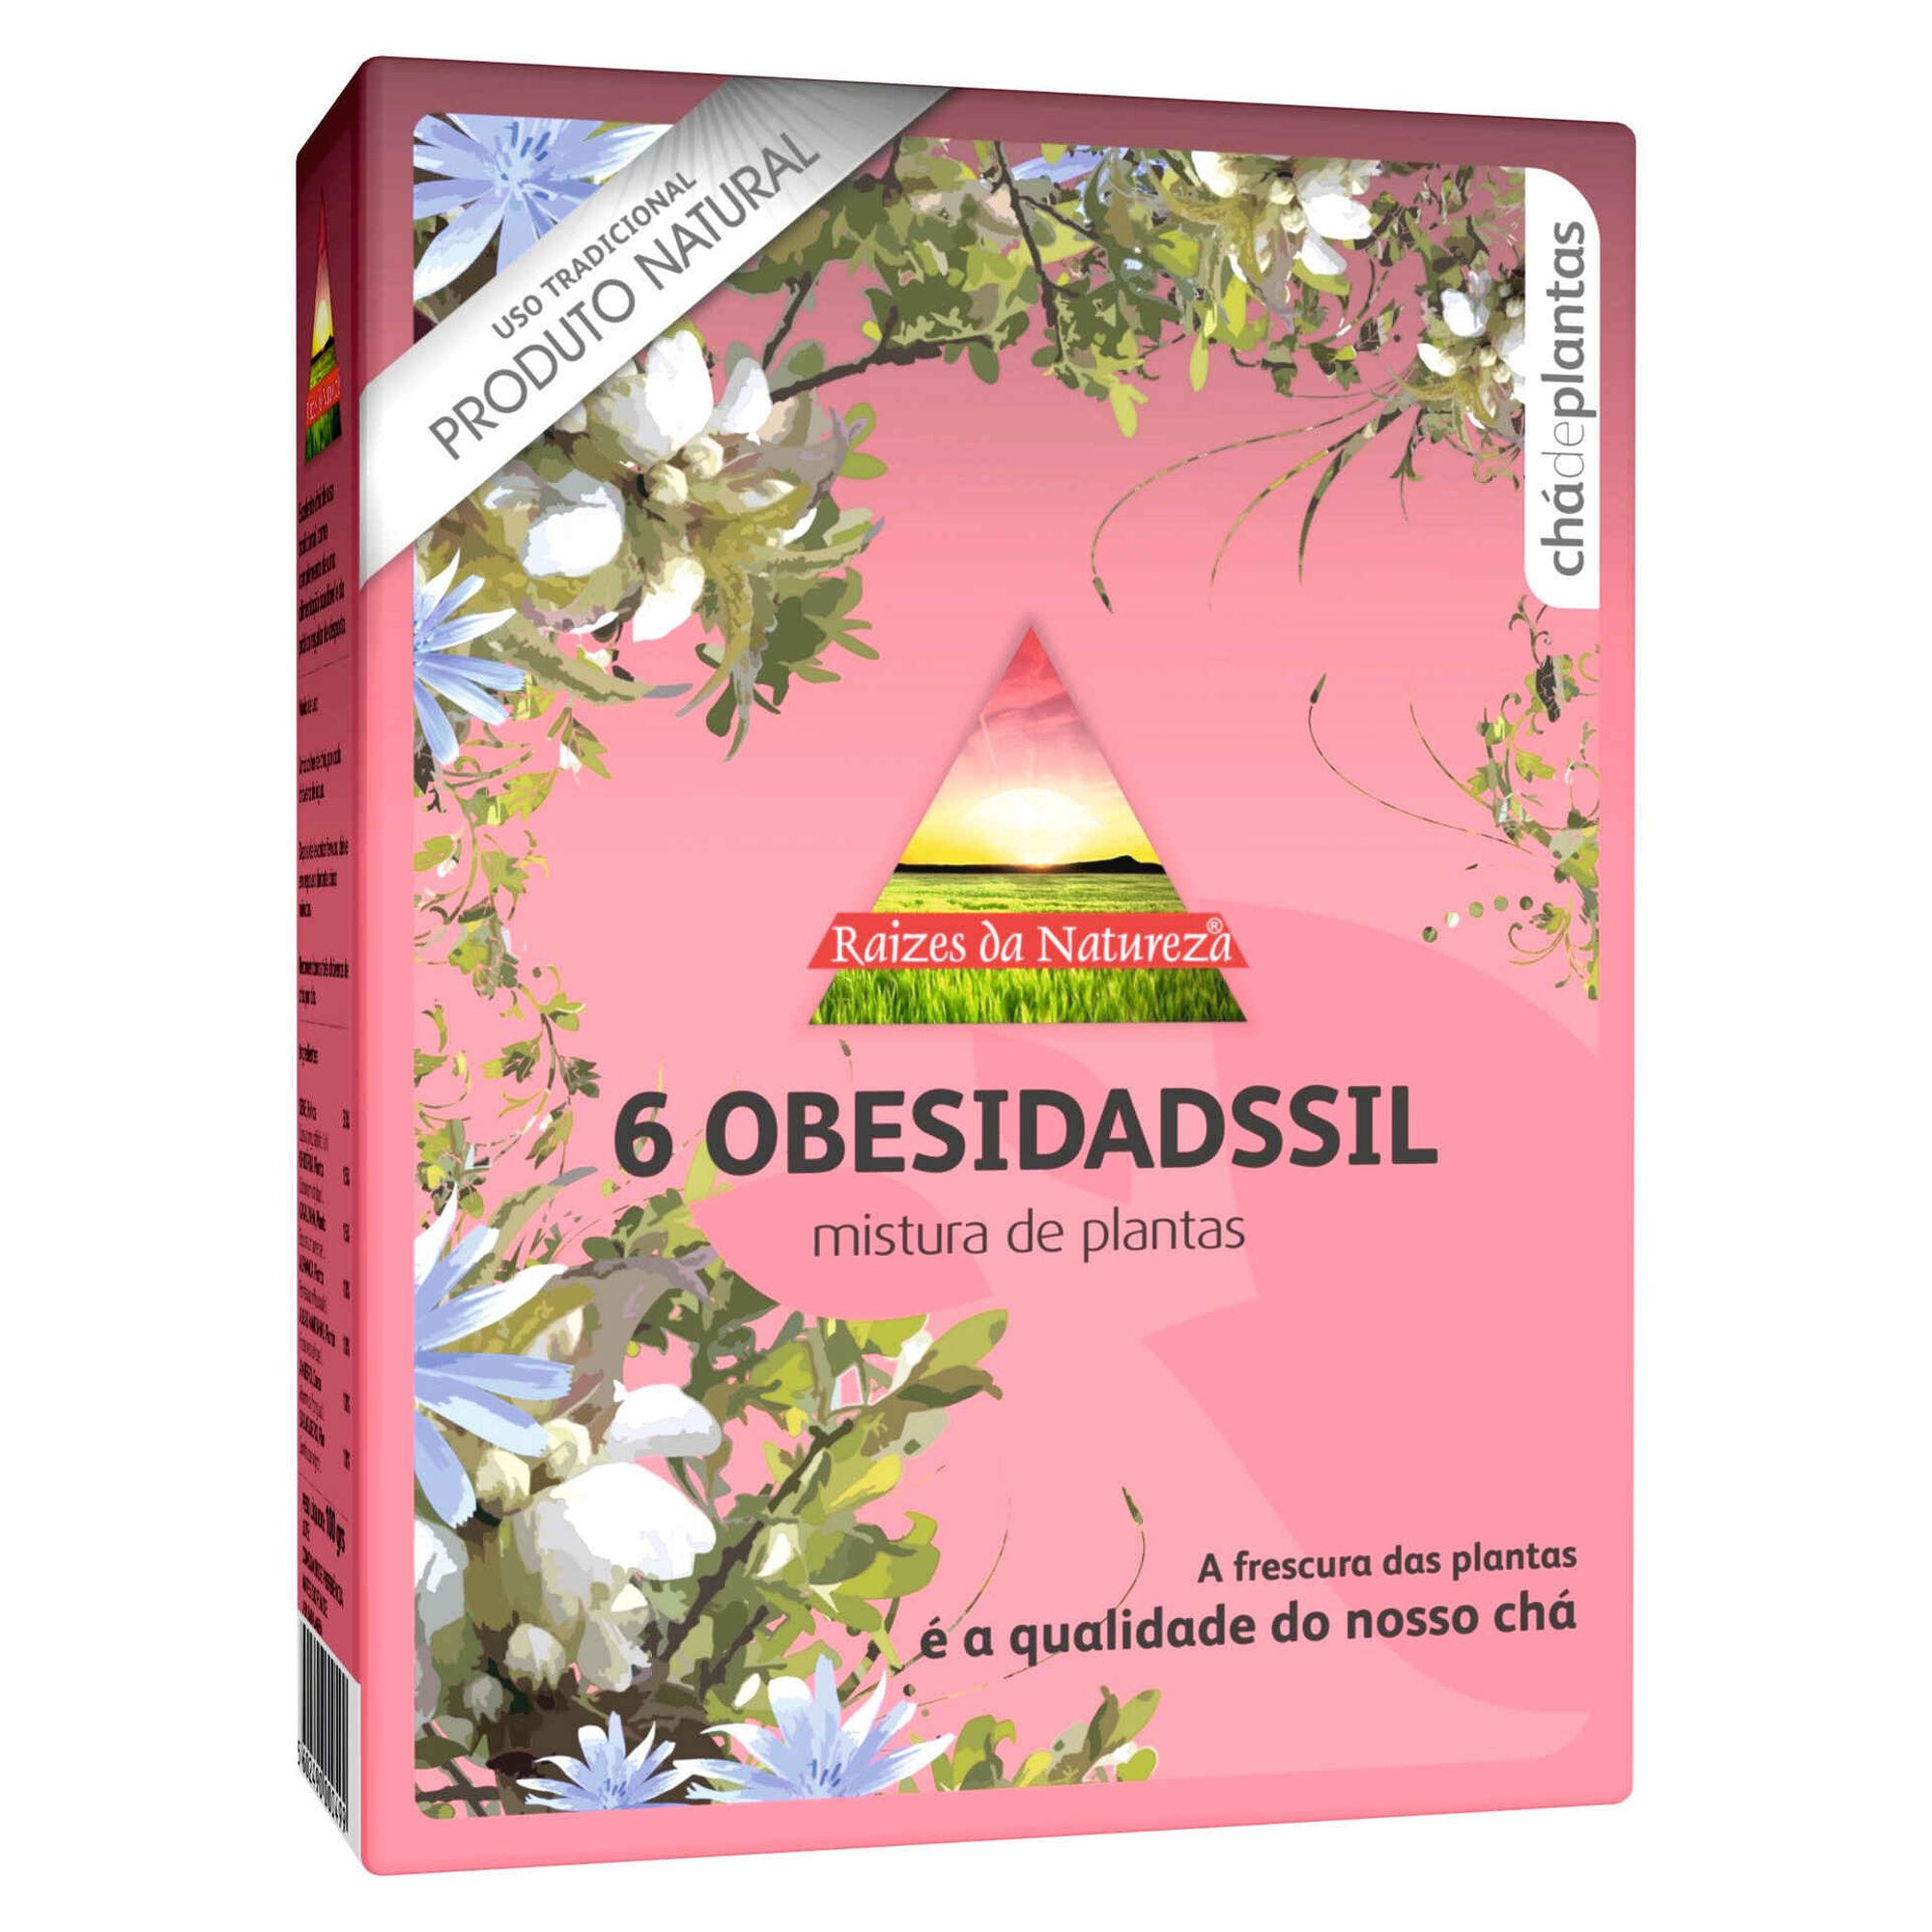 Chá de Plantas Nº6 Obesidadssil Saquetas